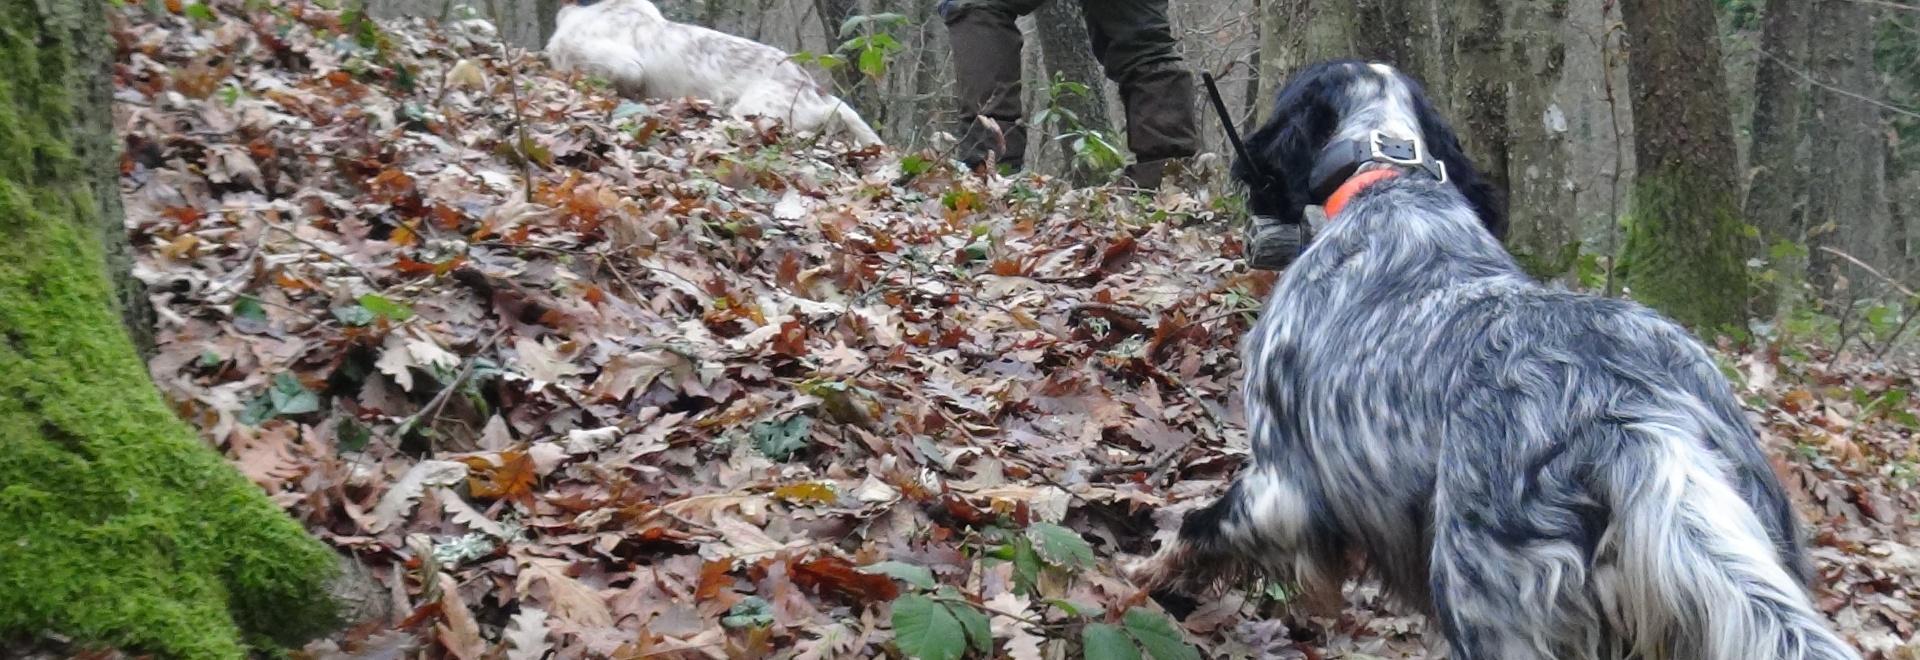 Addestrando cacciando